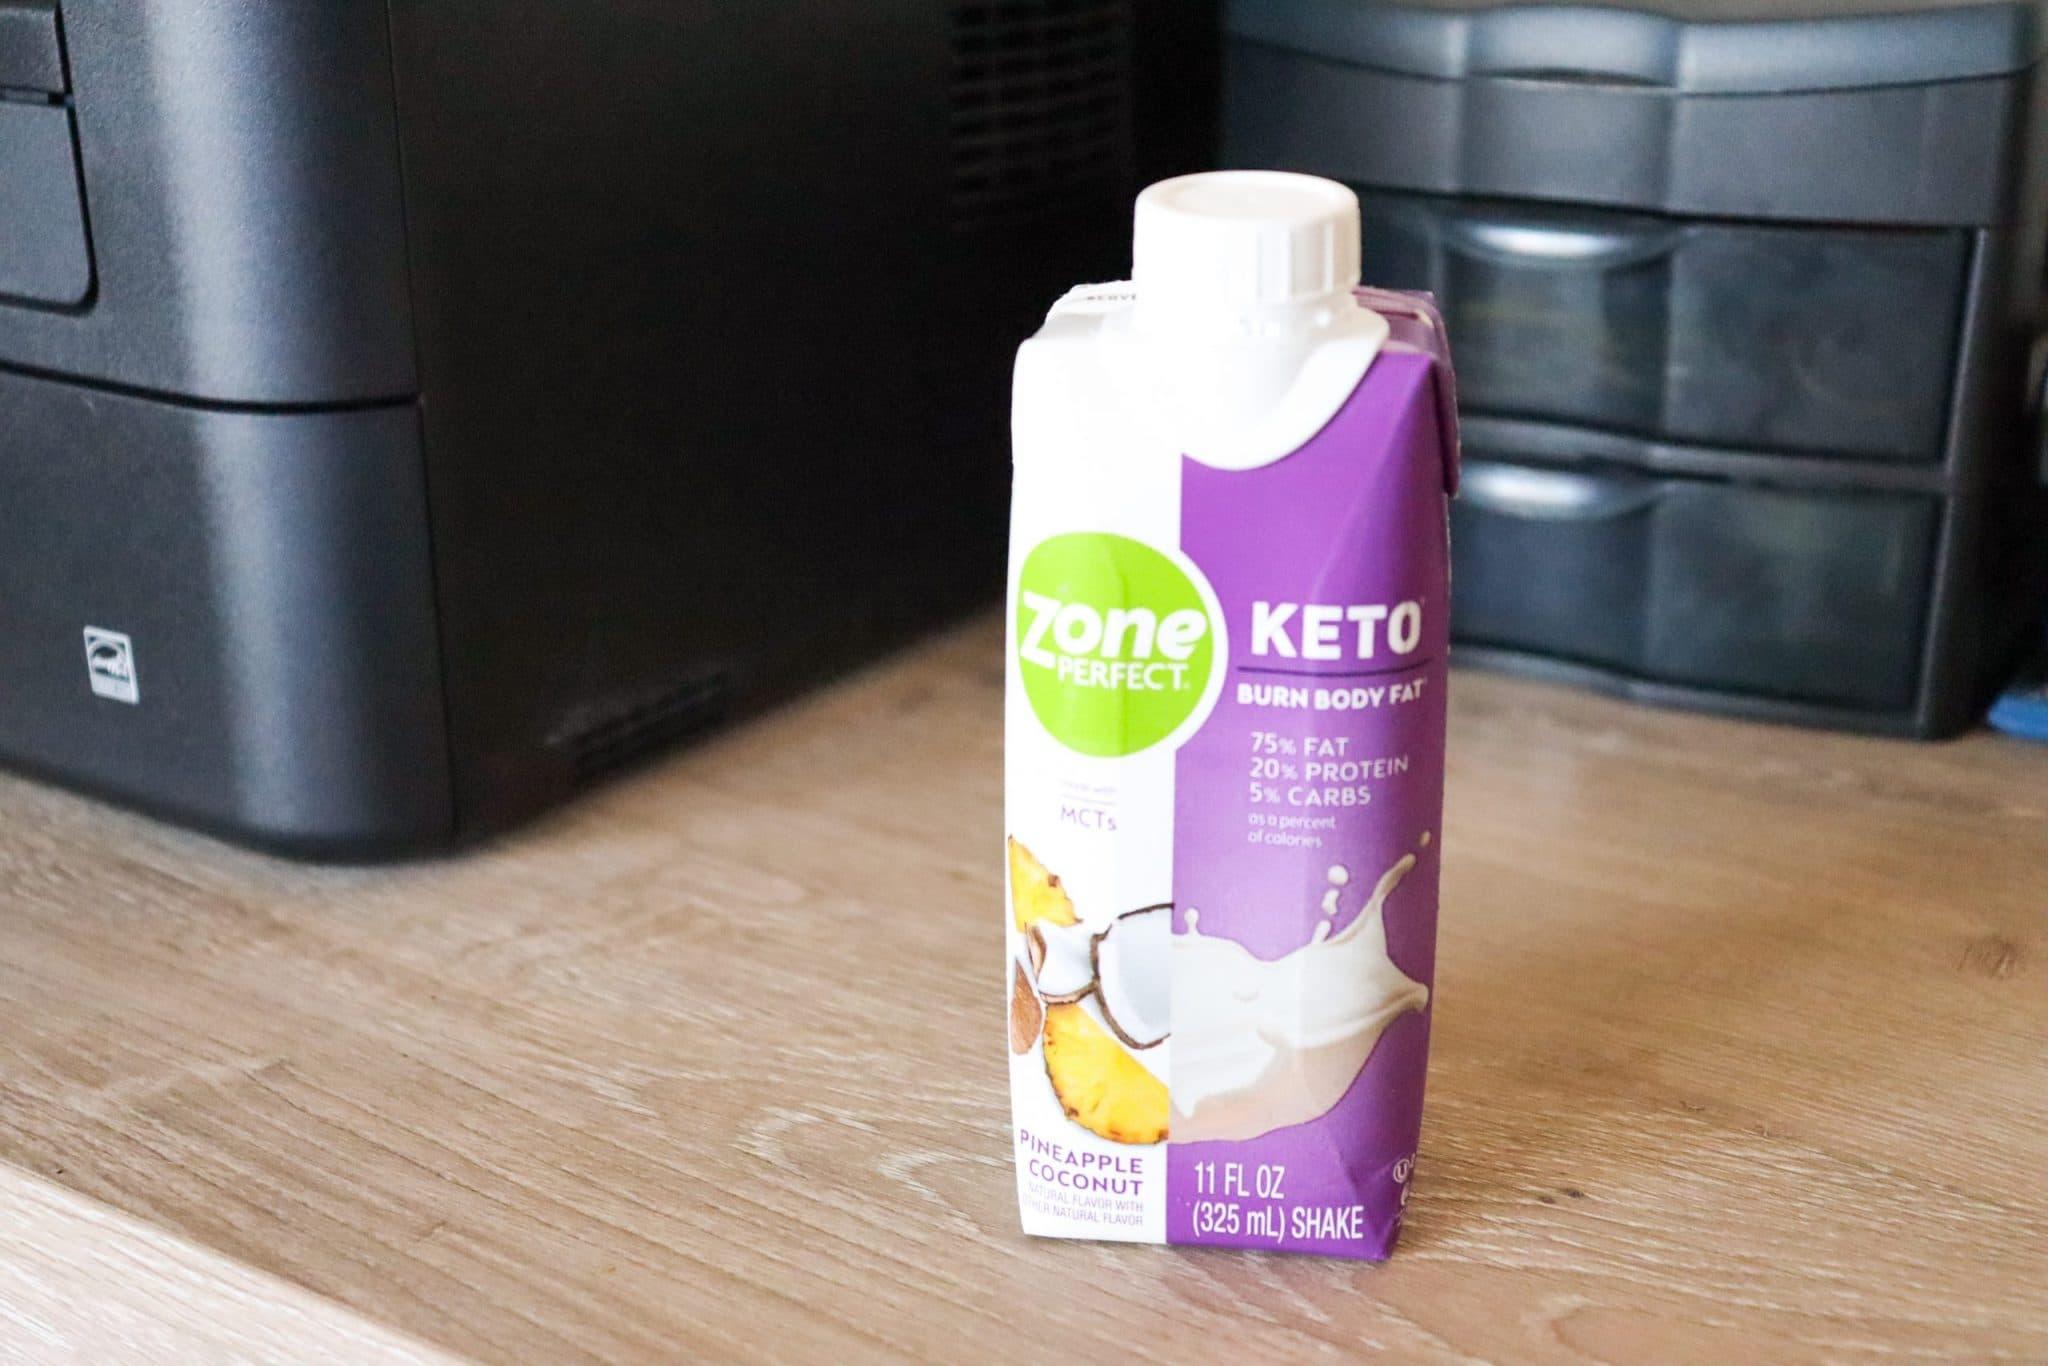 ZonePerfect Keto Shakes Office